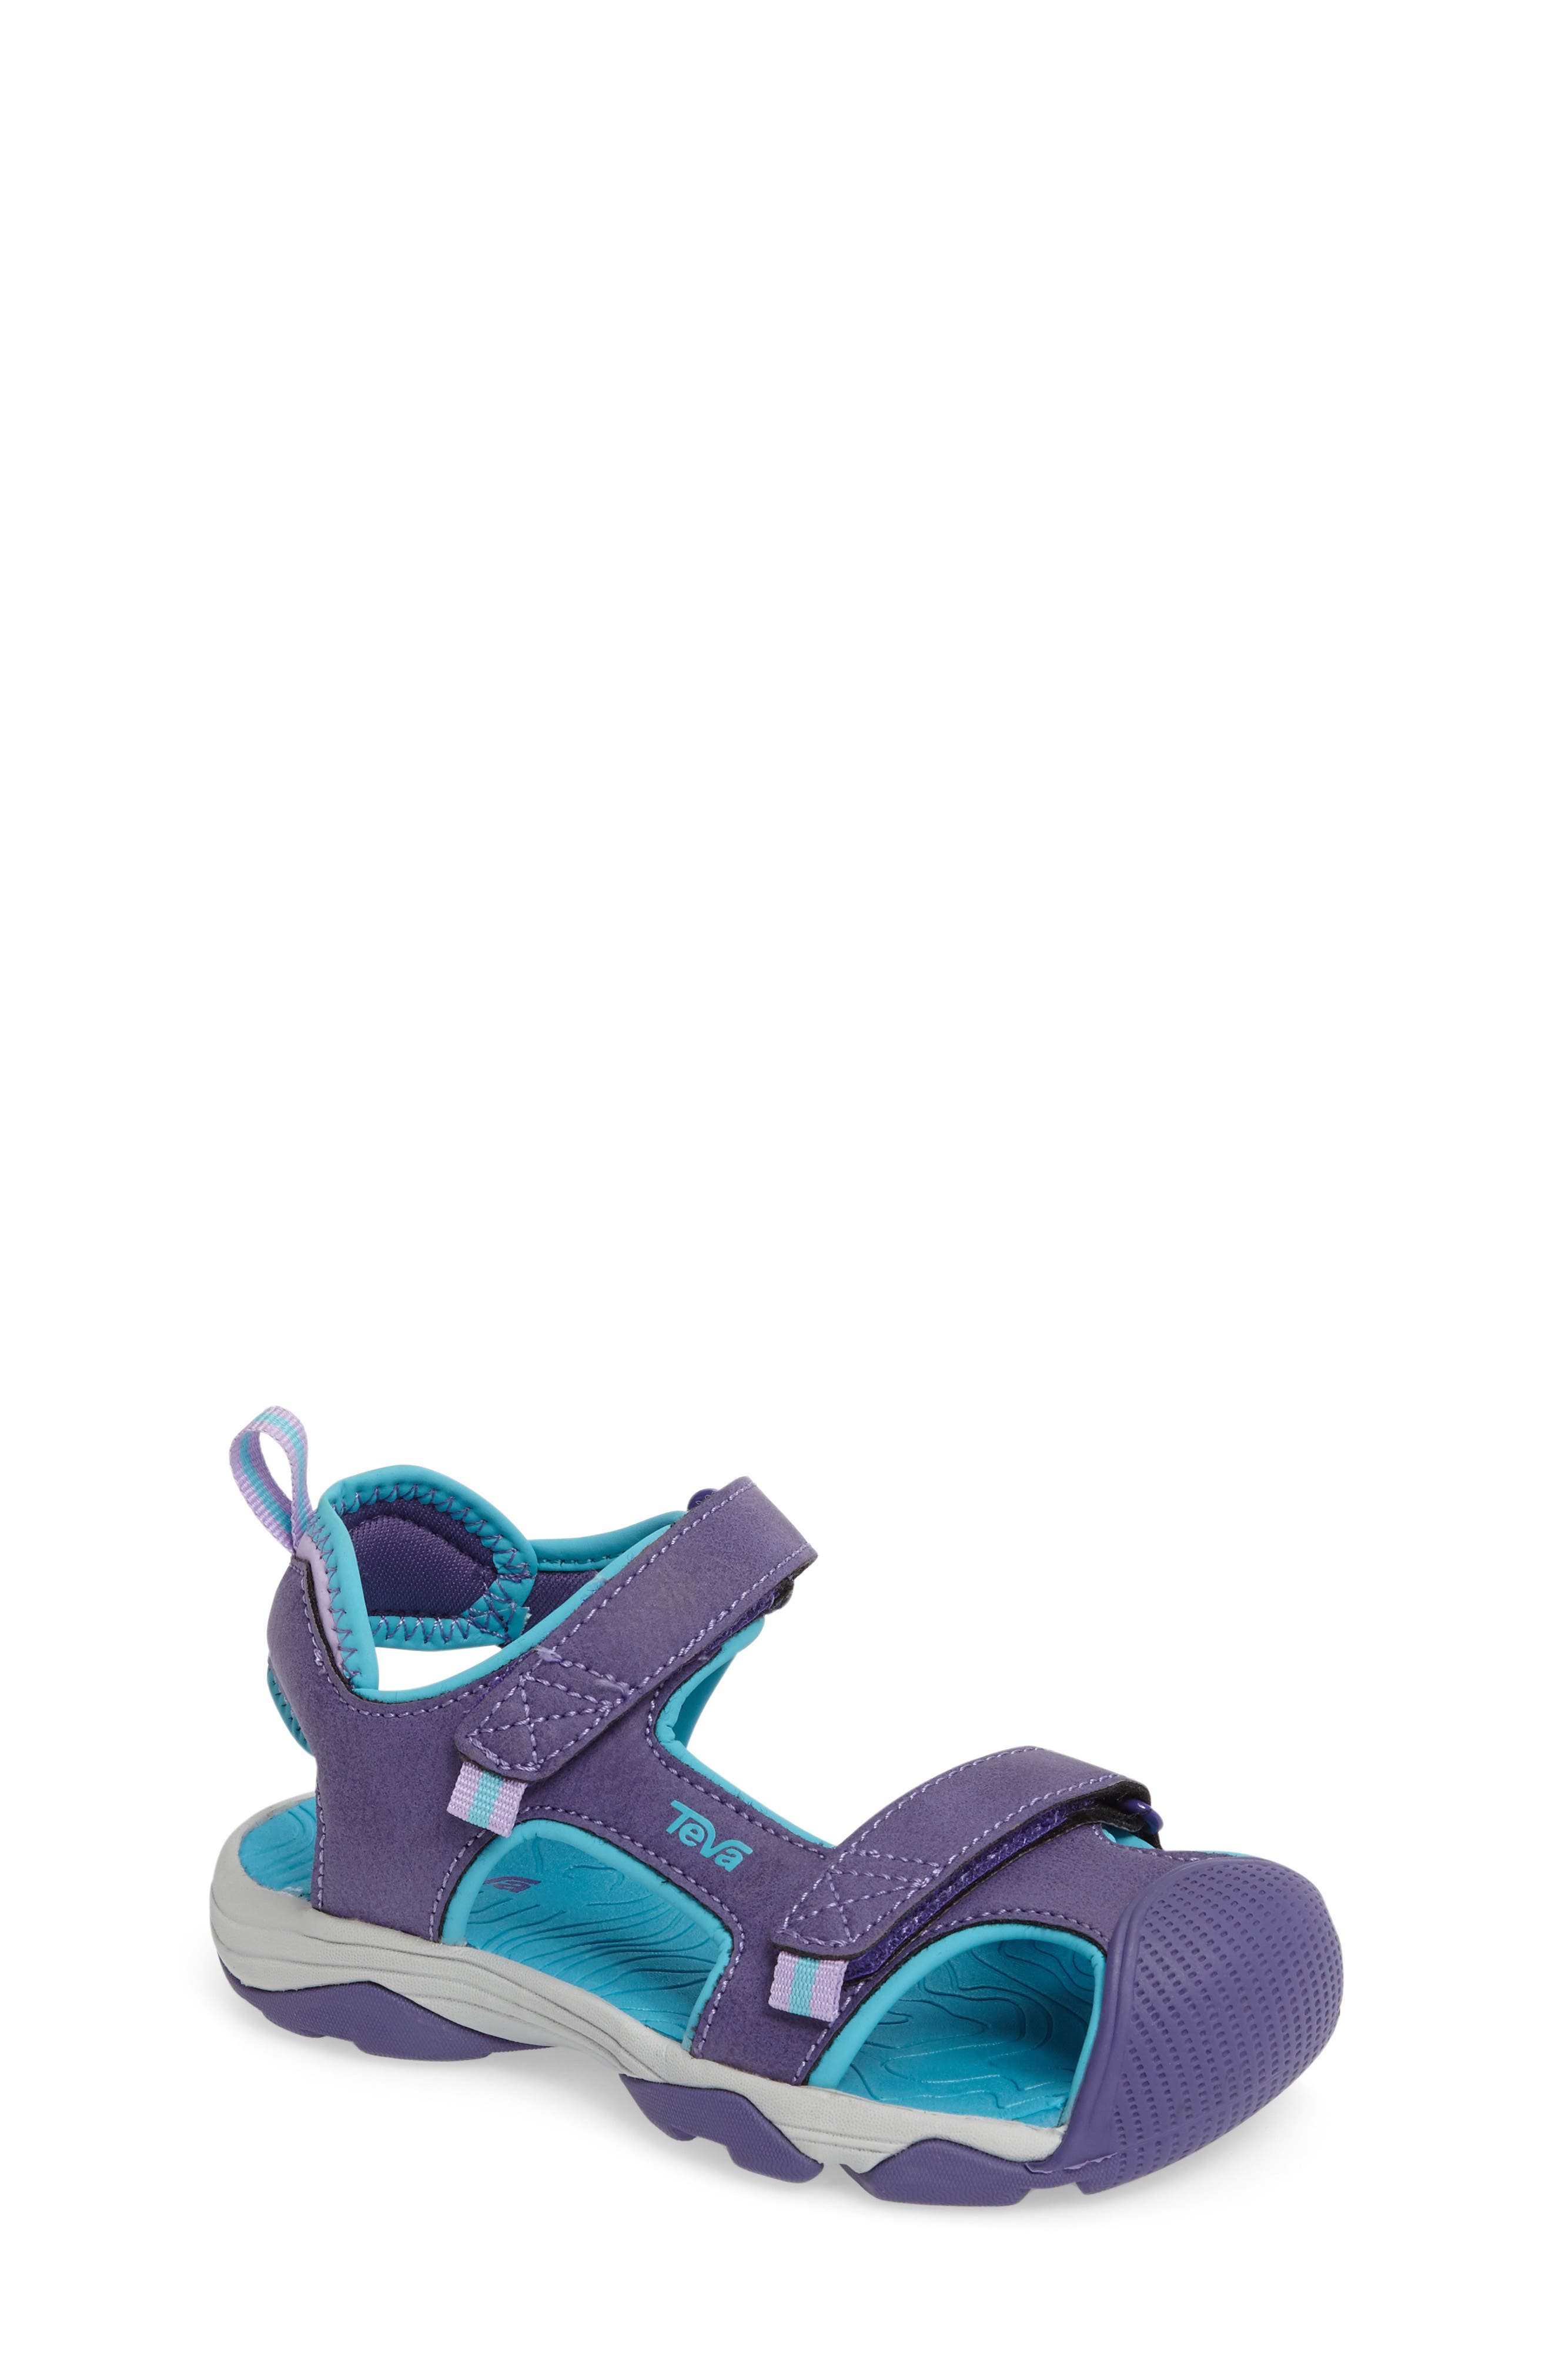 Teva Toachi 4 Sport Sandal (Toddler, Little Kid & Big Kid)